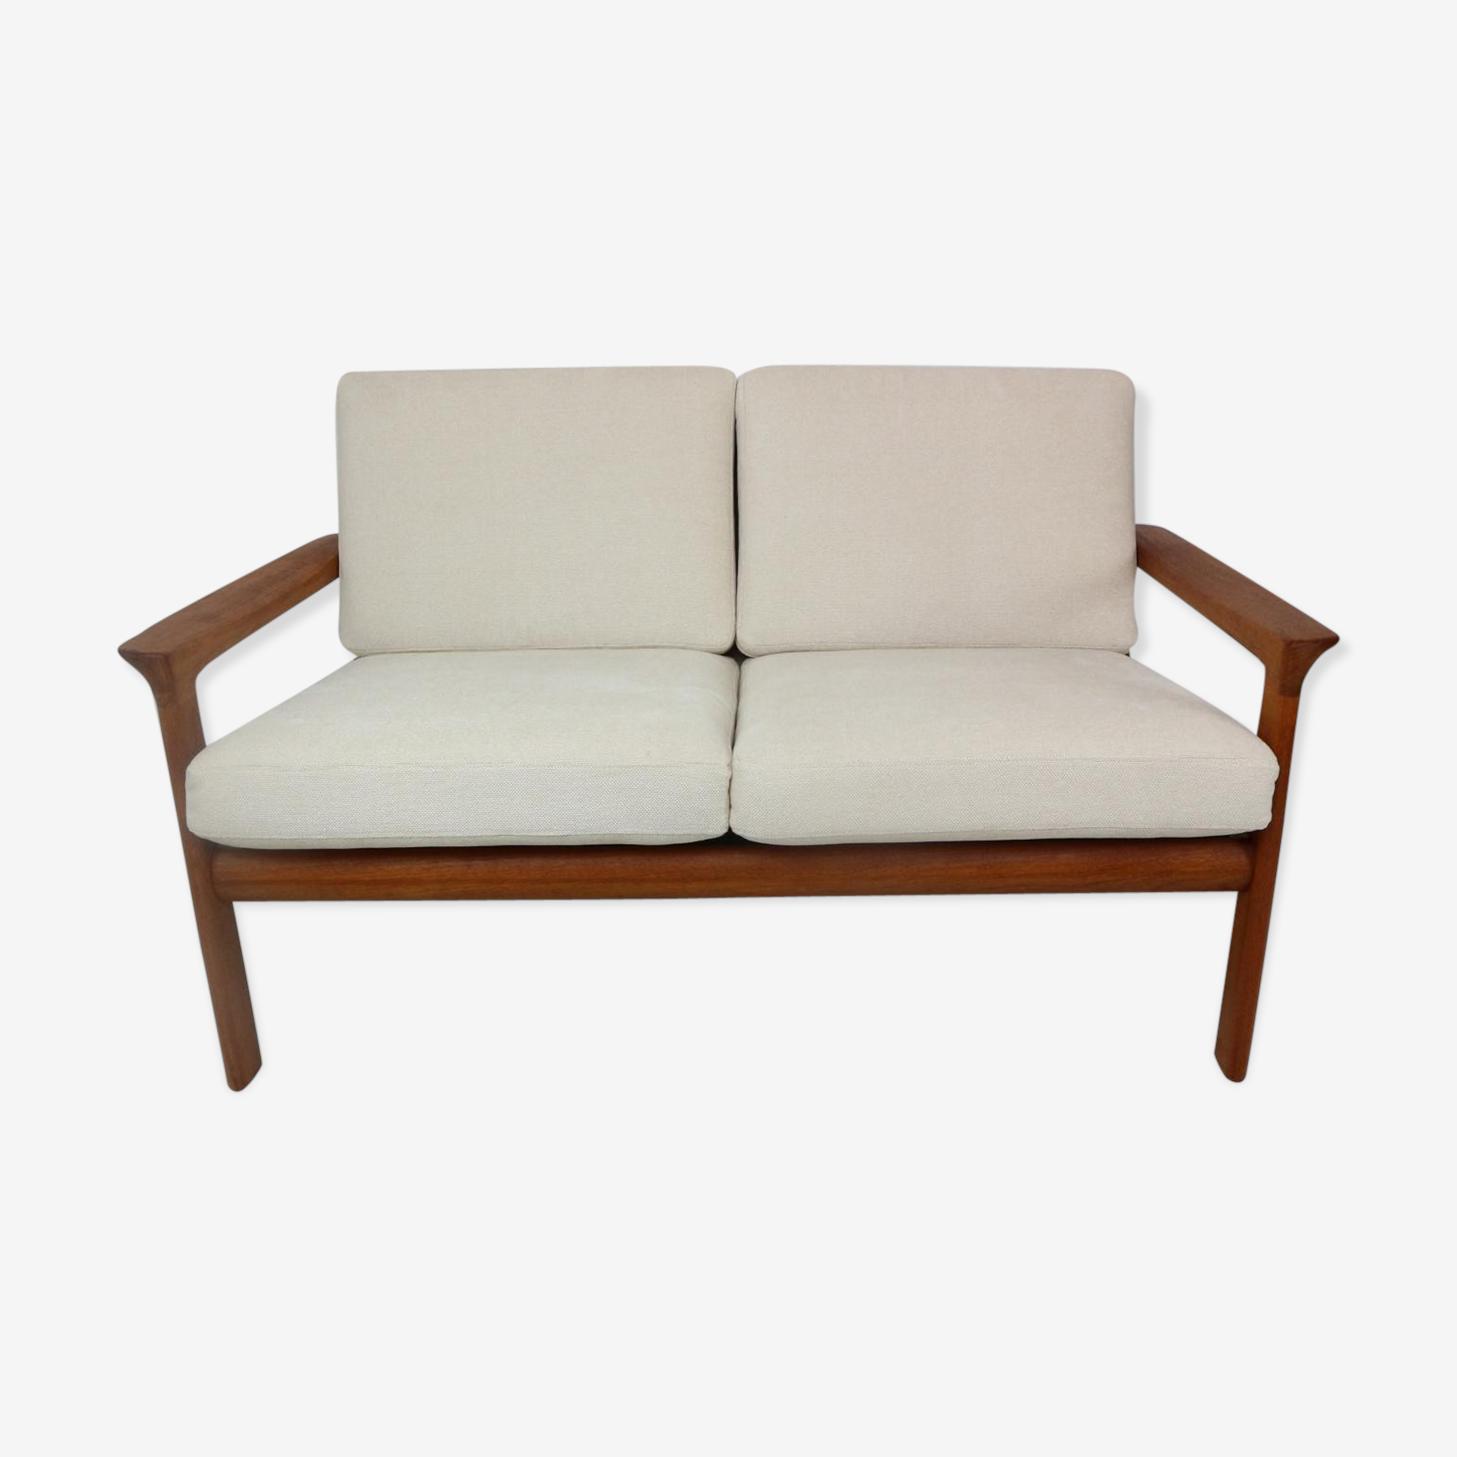 Two-seater sofa Borneo by Sven Ellekaer for Komfort 60s